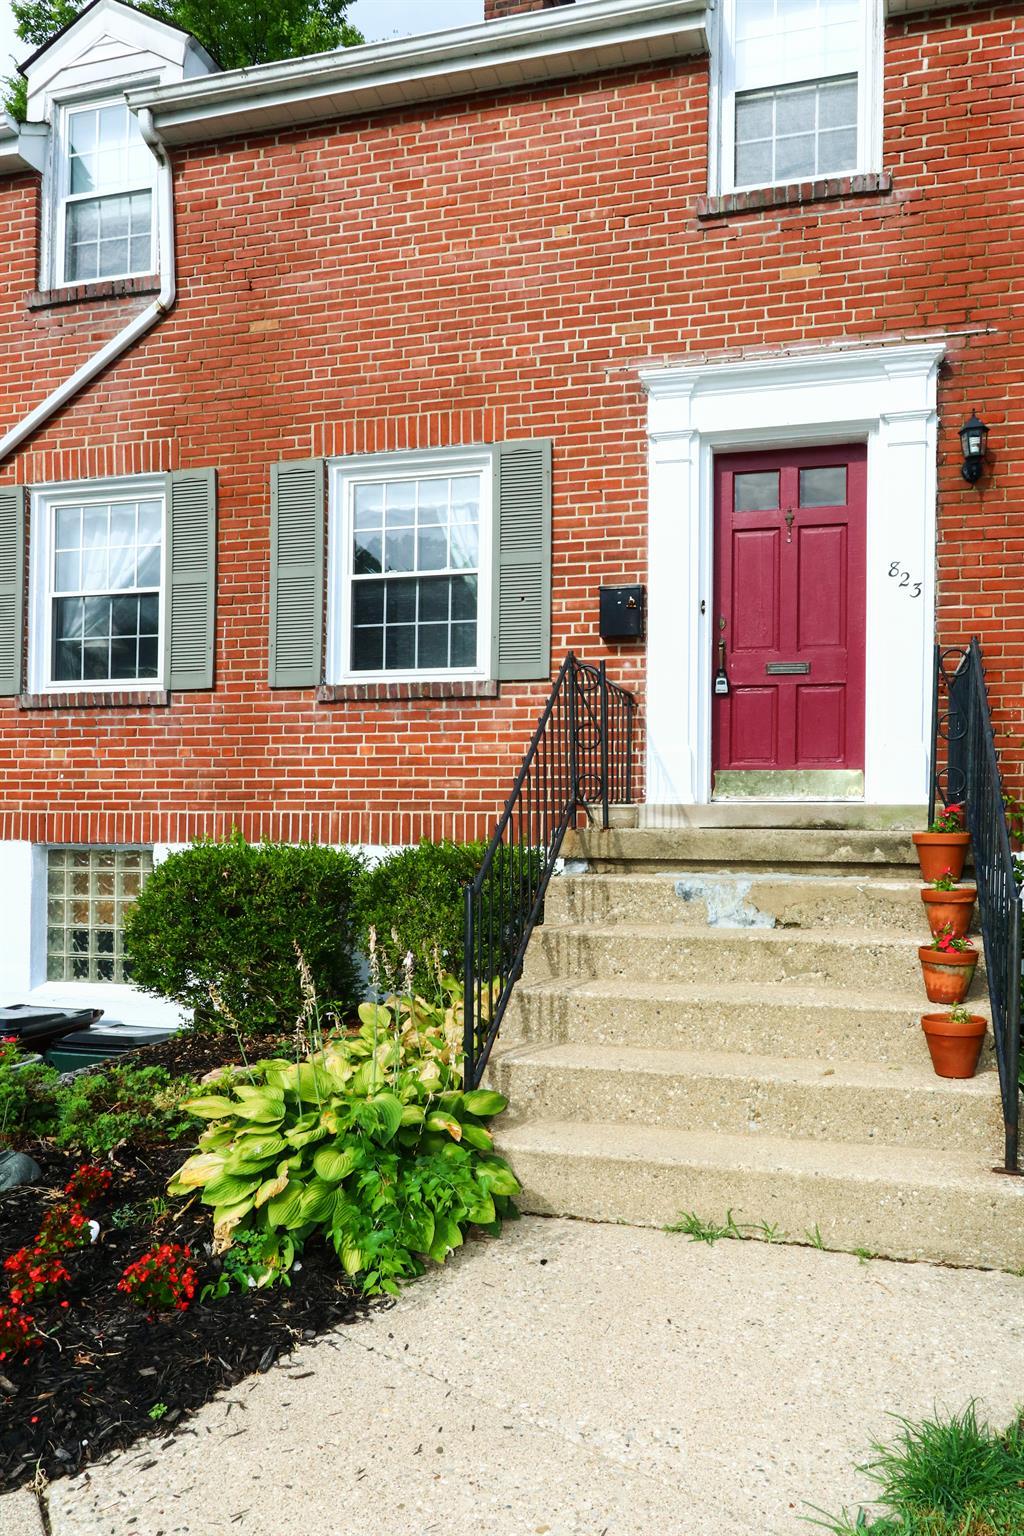 Entrance for 823 Saint James Ave Park Hills, KY 41011